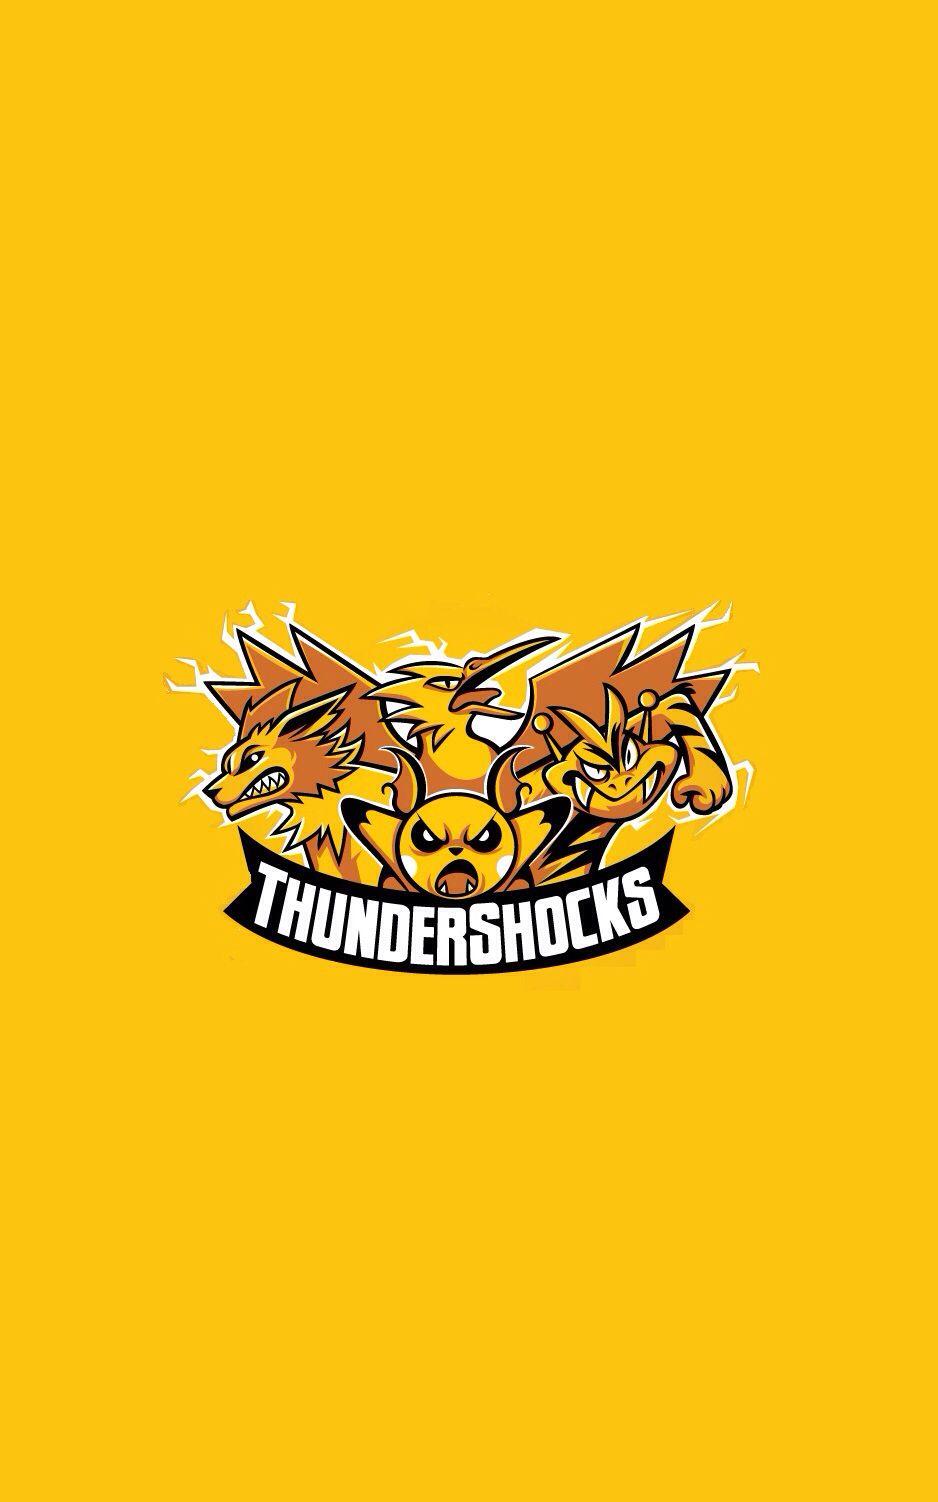 Thundershocks Pokemon IPhone 5 Wallpaper